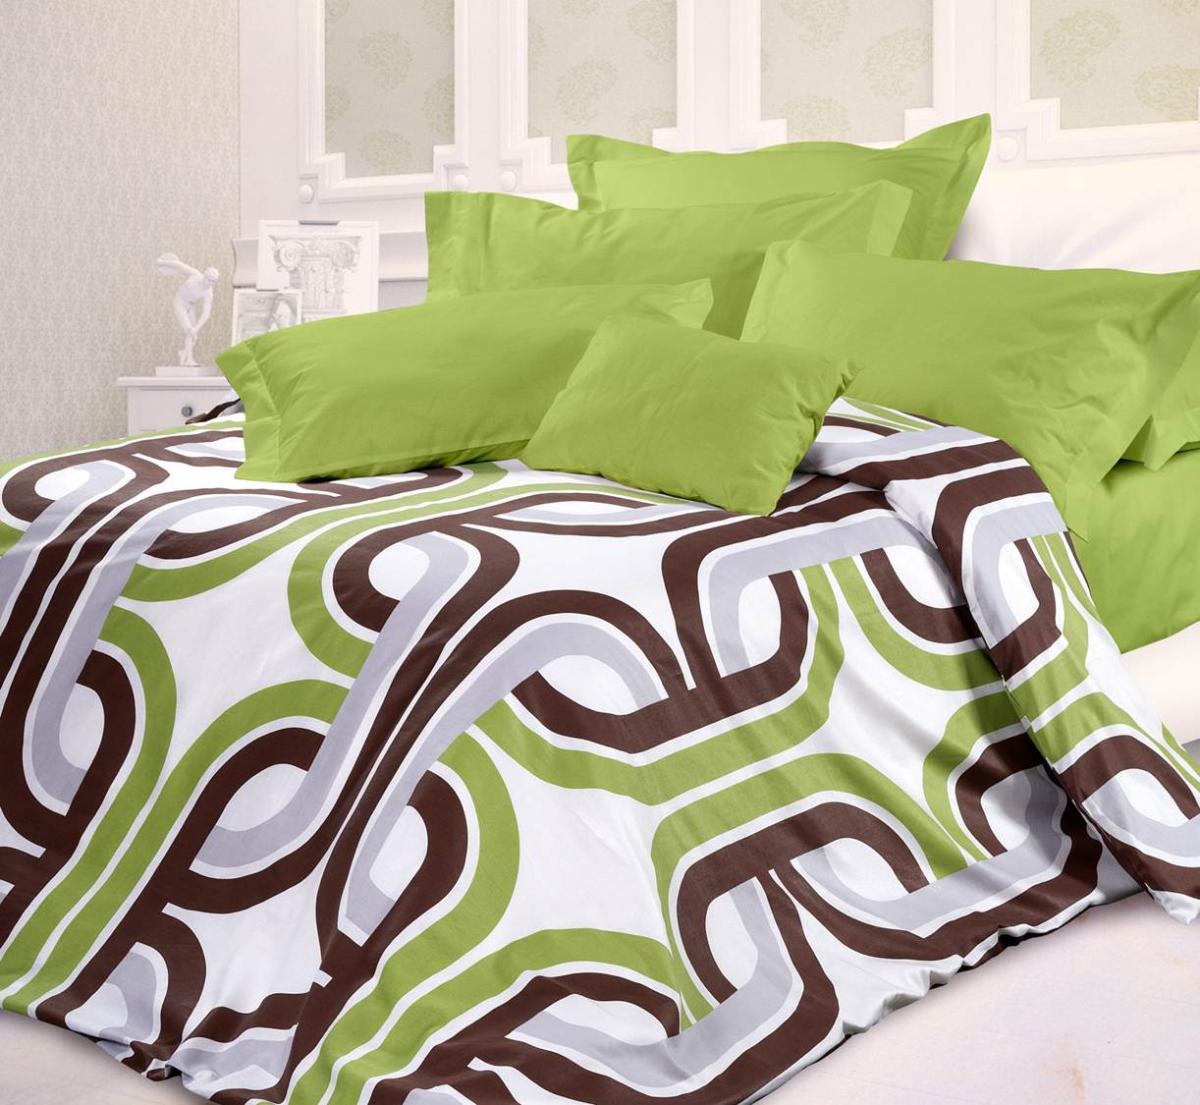 Комплект белья Унисон Антуан, 1,5-спальный, наволочки 70х70